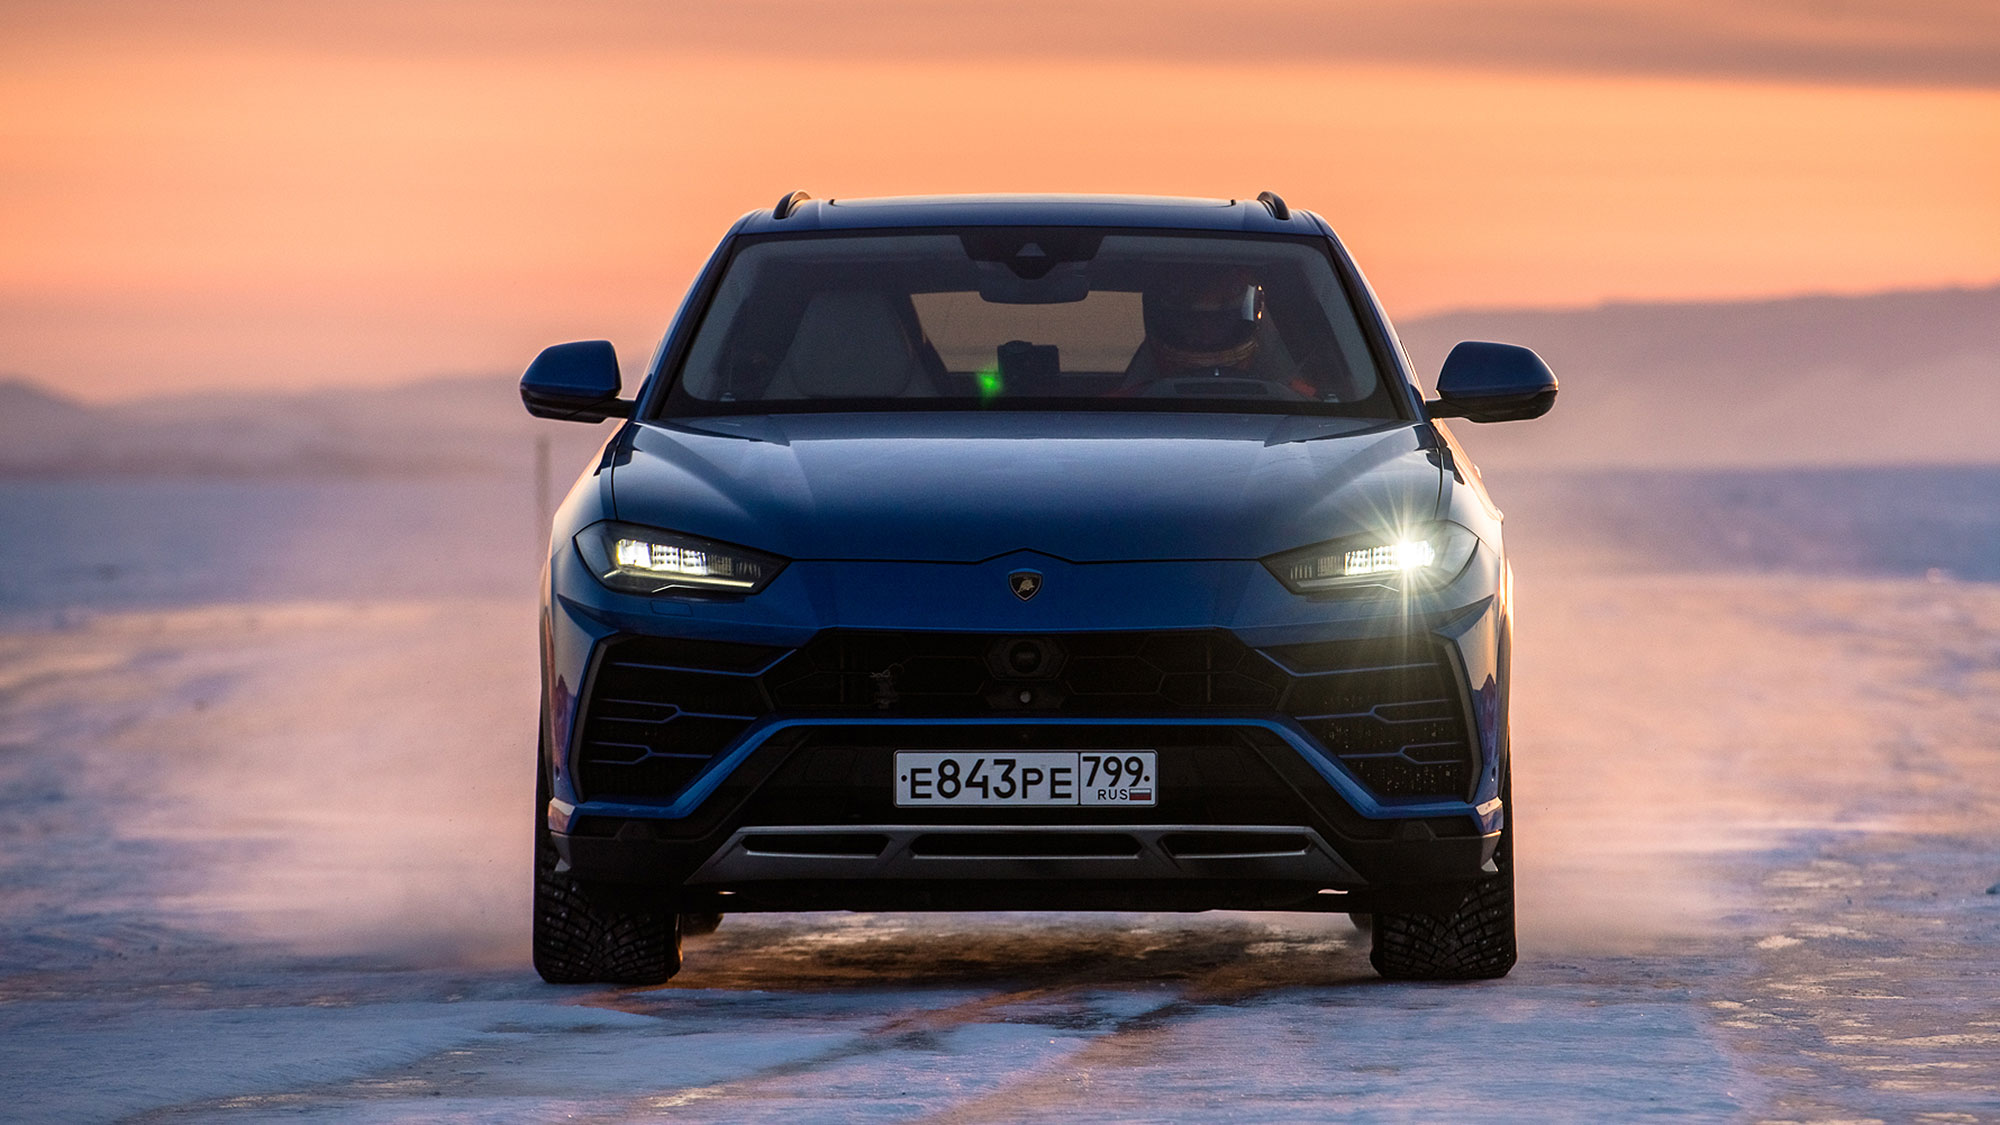 Lamborghini Urus Super SUV Sets High-speed Record On Ice